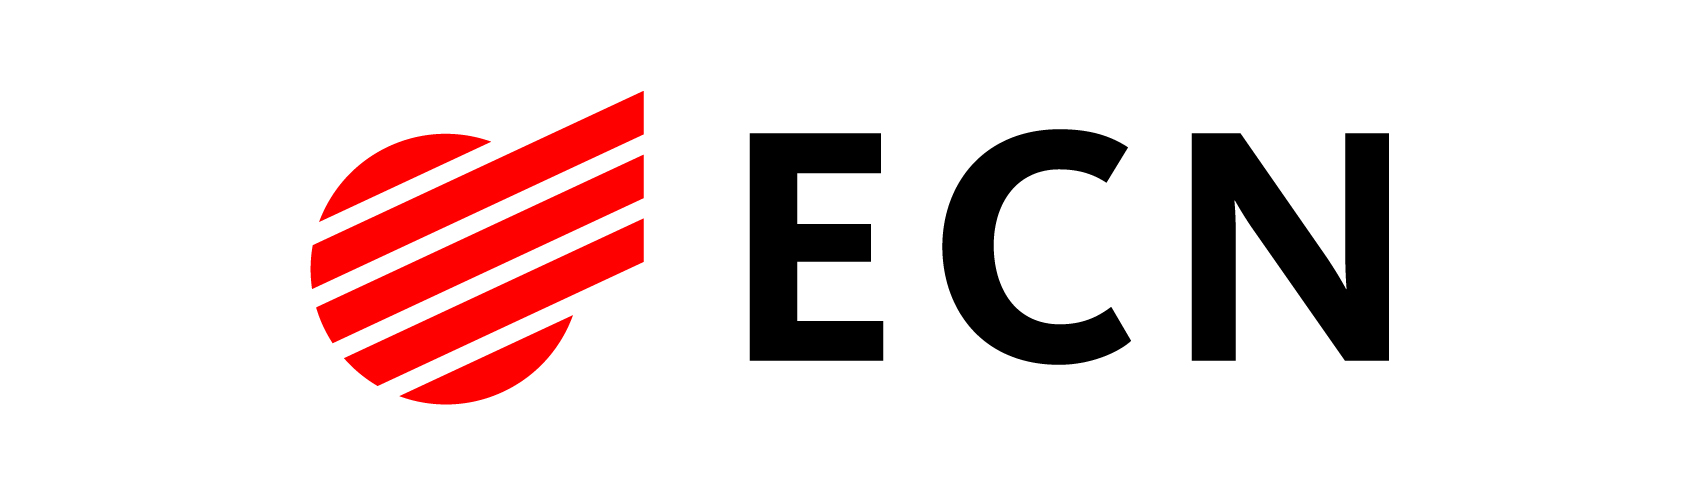 ecn_logo_mpo_rgb